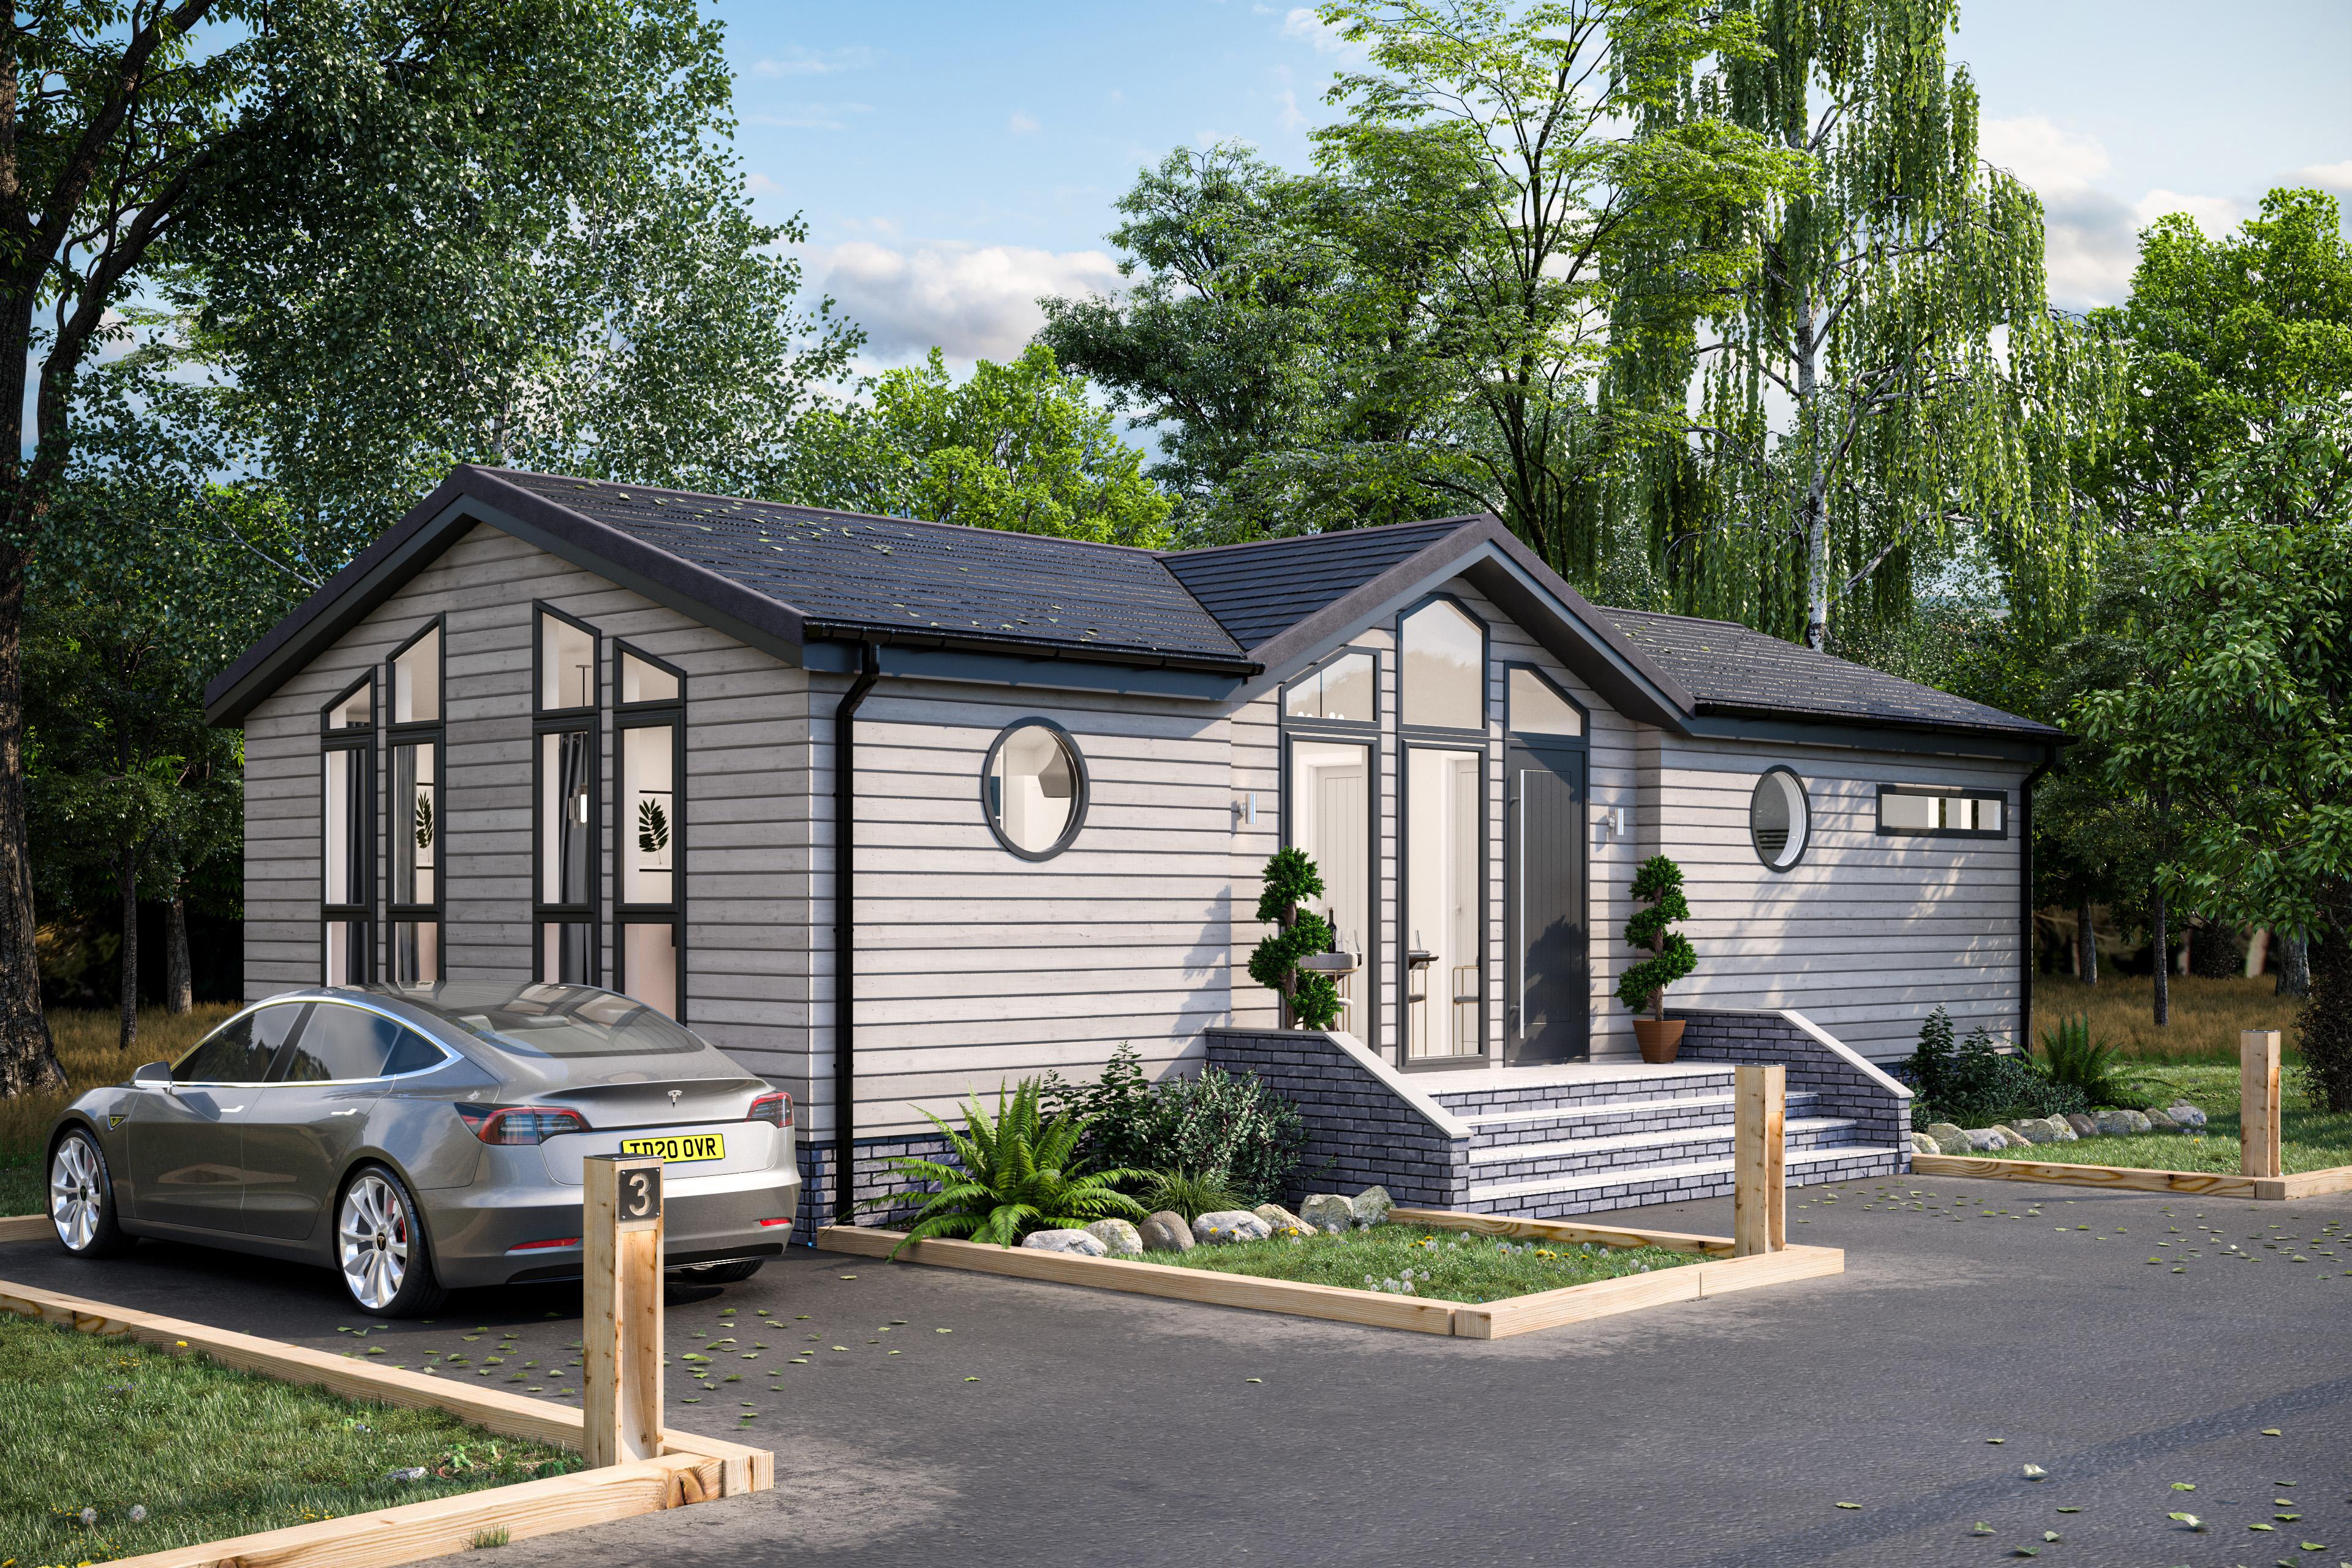 Tingdene_Overstone Lodge 4k v2-1